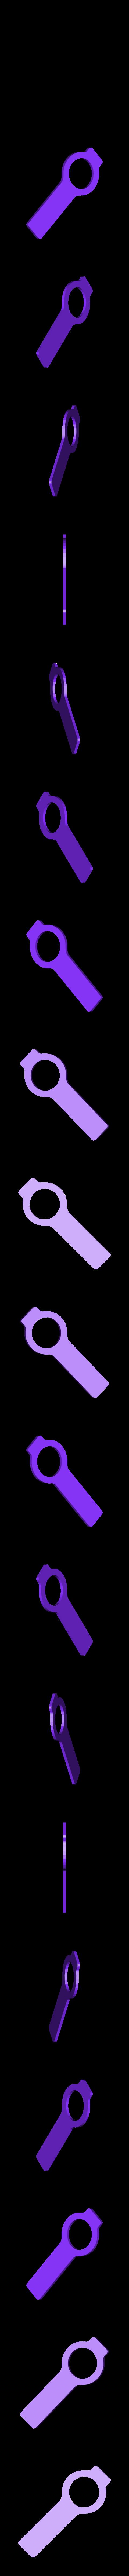 arm_skp.stl Download free STL file Catapult • 3D print template, Azagal